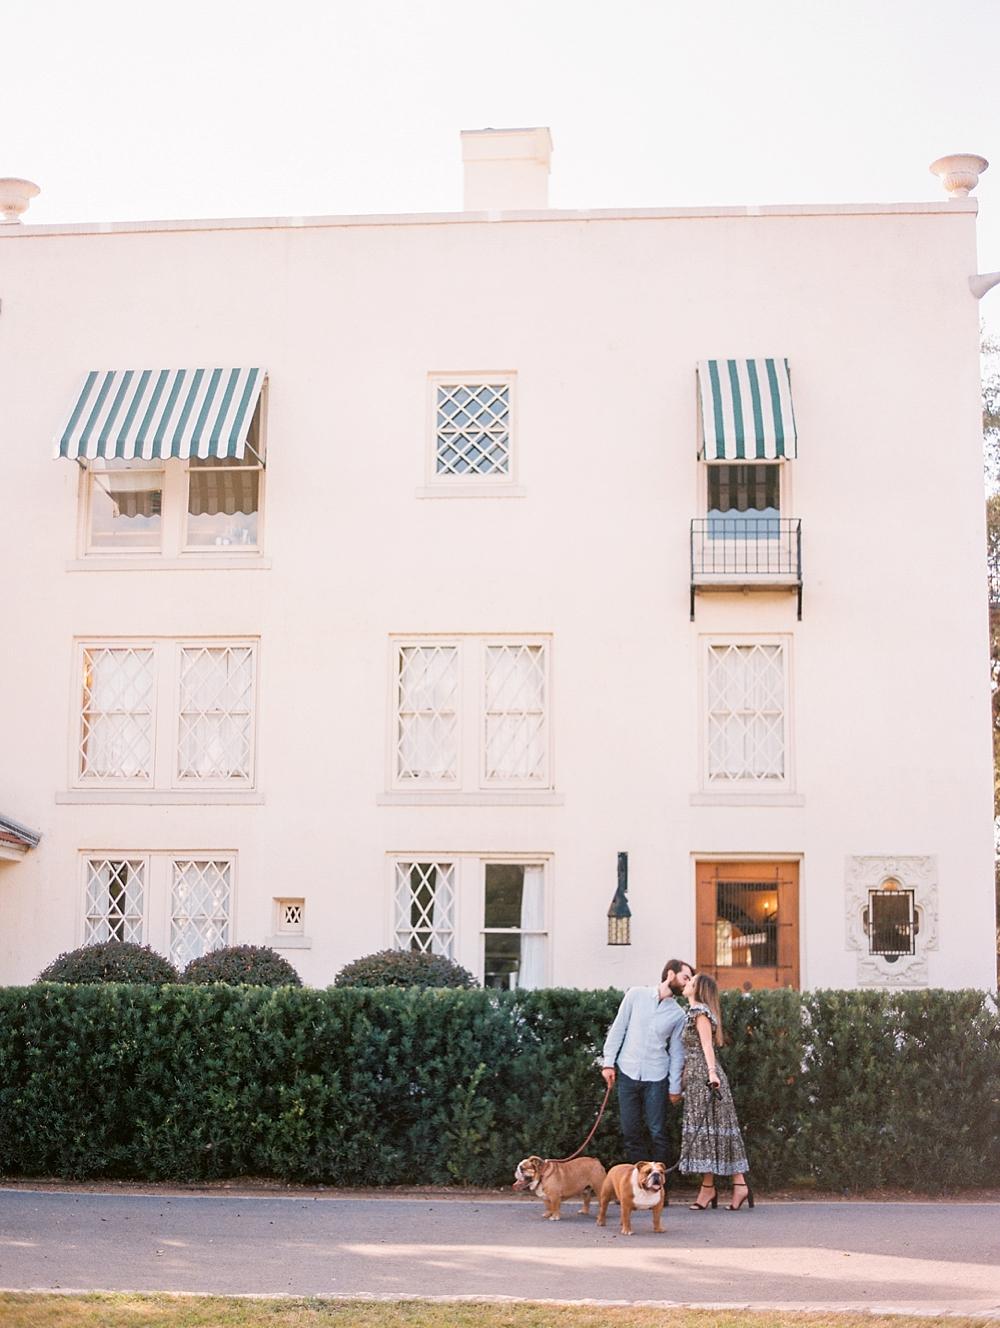 kristin-la-voie-photography-Austin-Wedding-Photographer-laguna-gloria-commodore-perry-estate-engagement-44